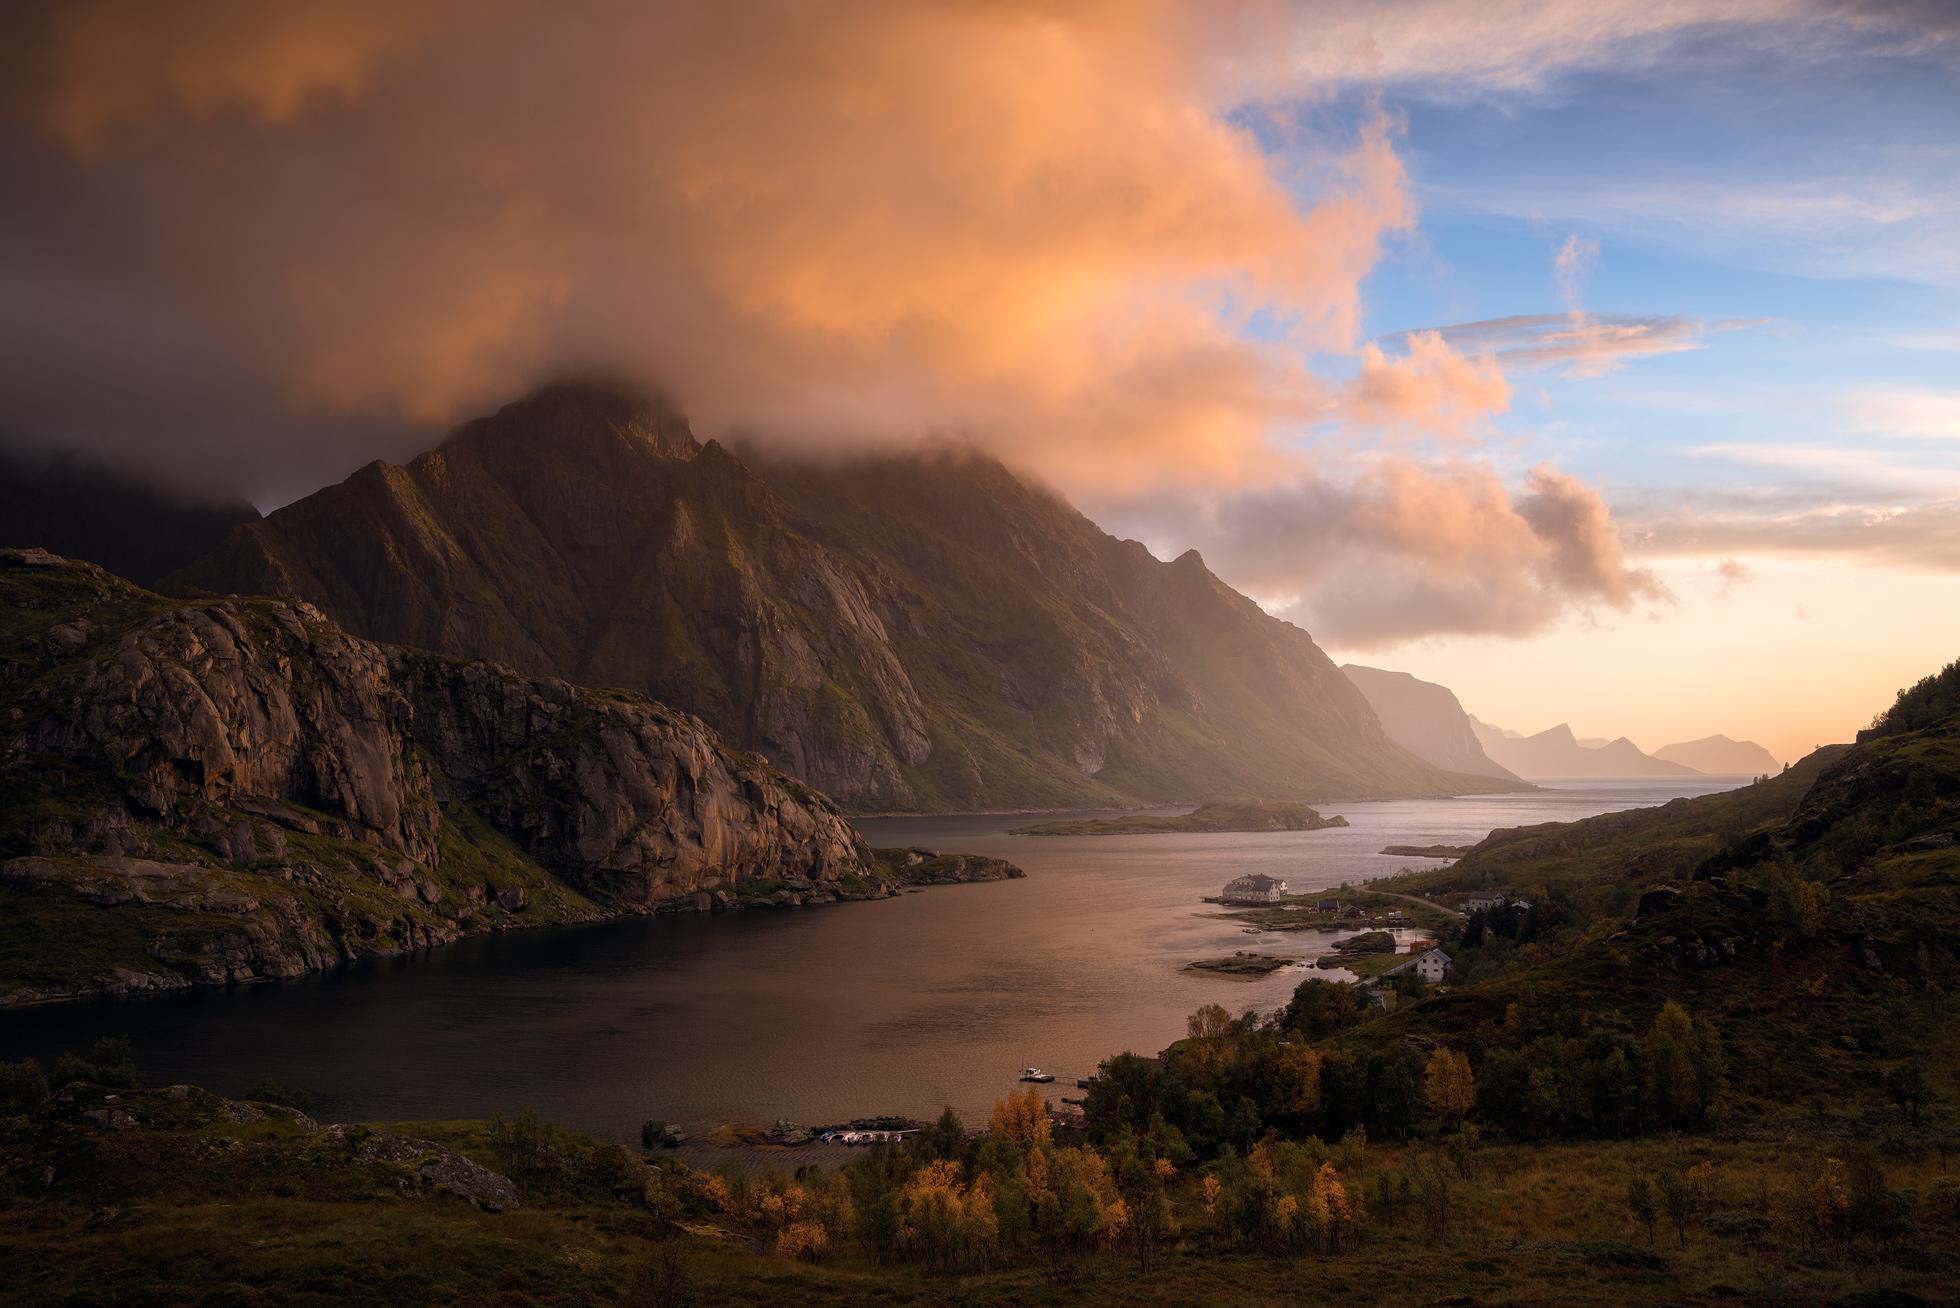 Lofoten-Unstad-View-Sunset.jpg